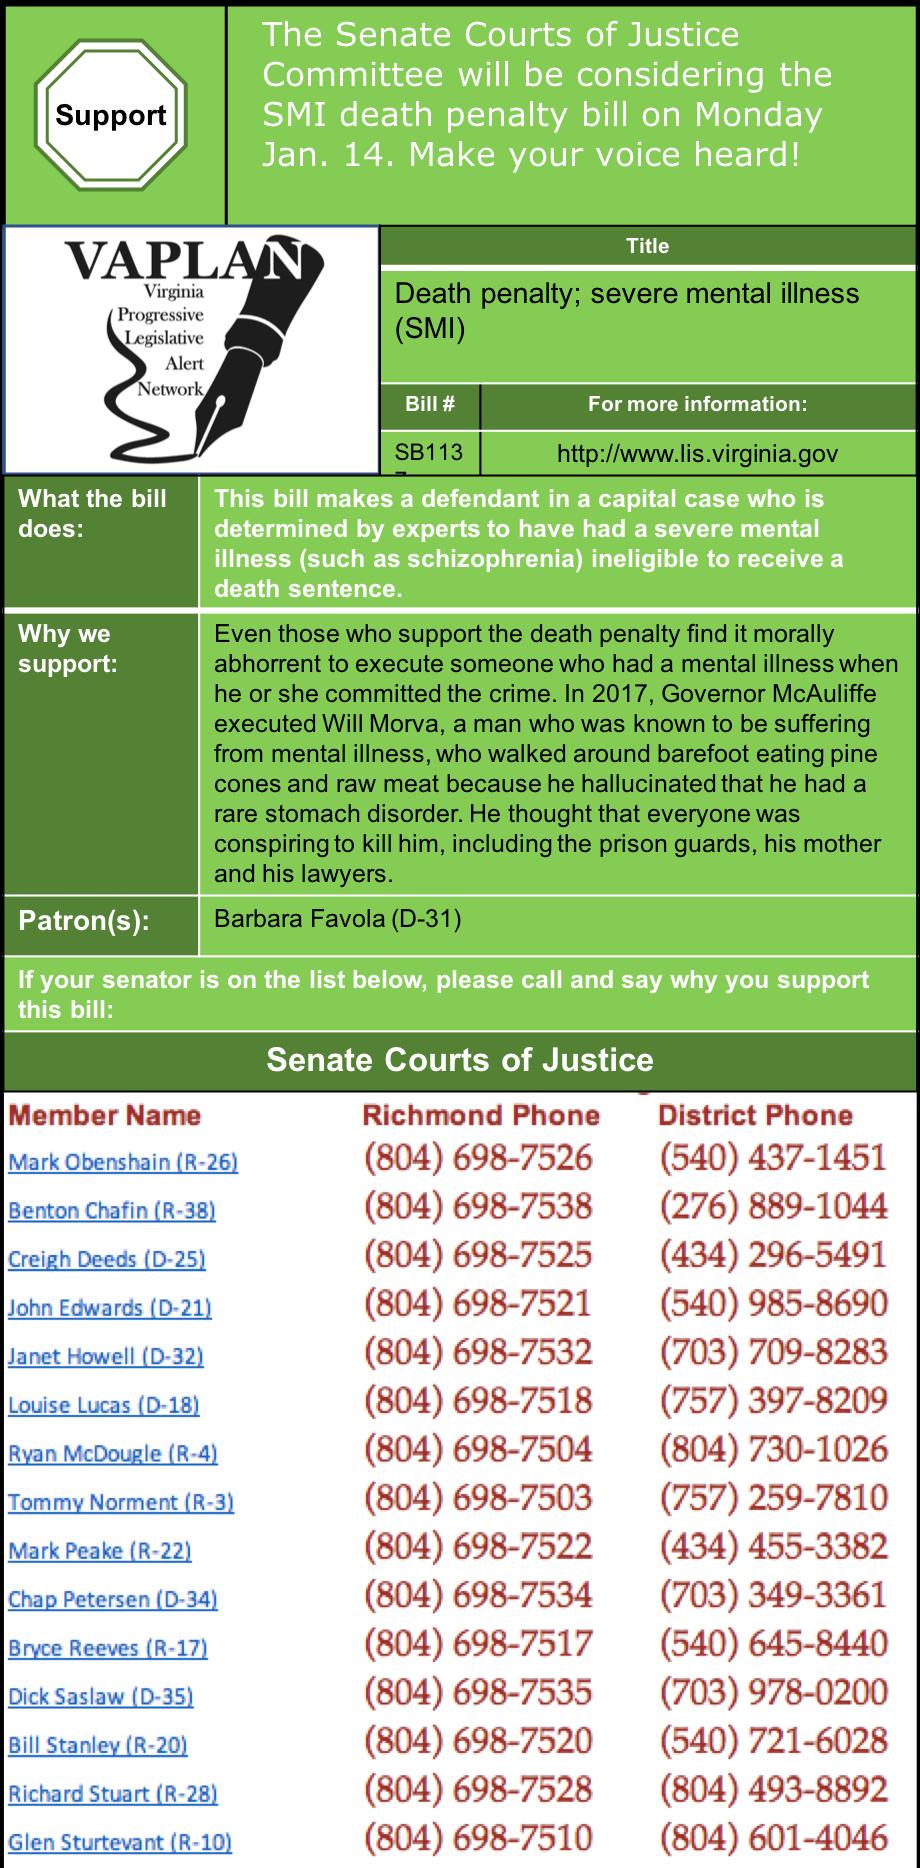 ALERT: Senate Courts of Justice considers death penalty SMI bill